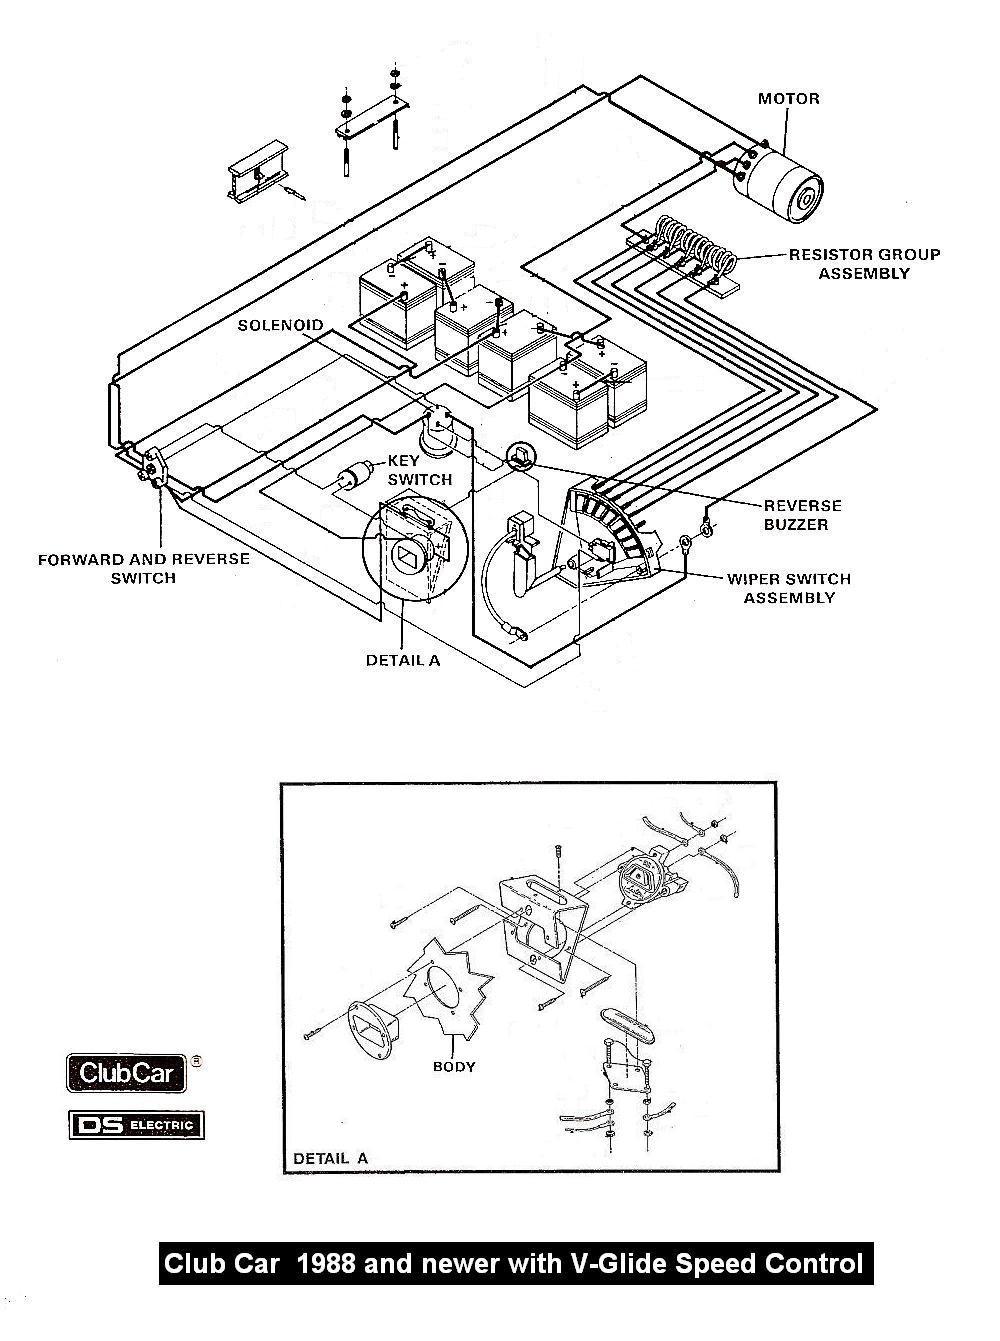 05 Club Car Wiring Diagram Schematic Diagrams 48v W Obc 36 Volt Awesome Image Tripac Apu